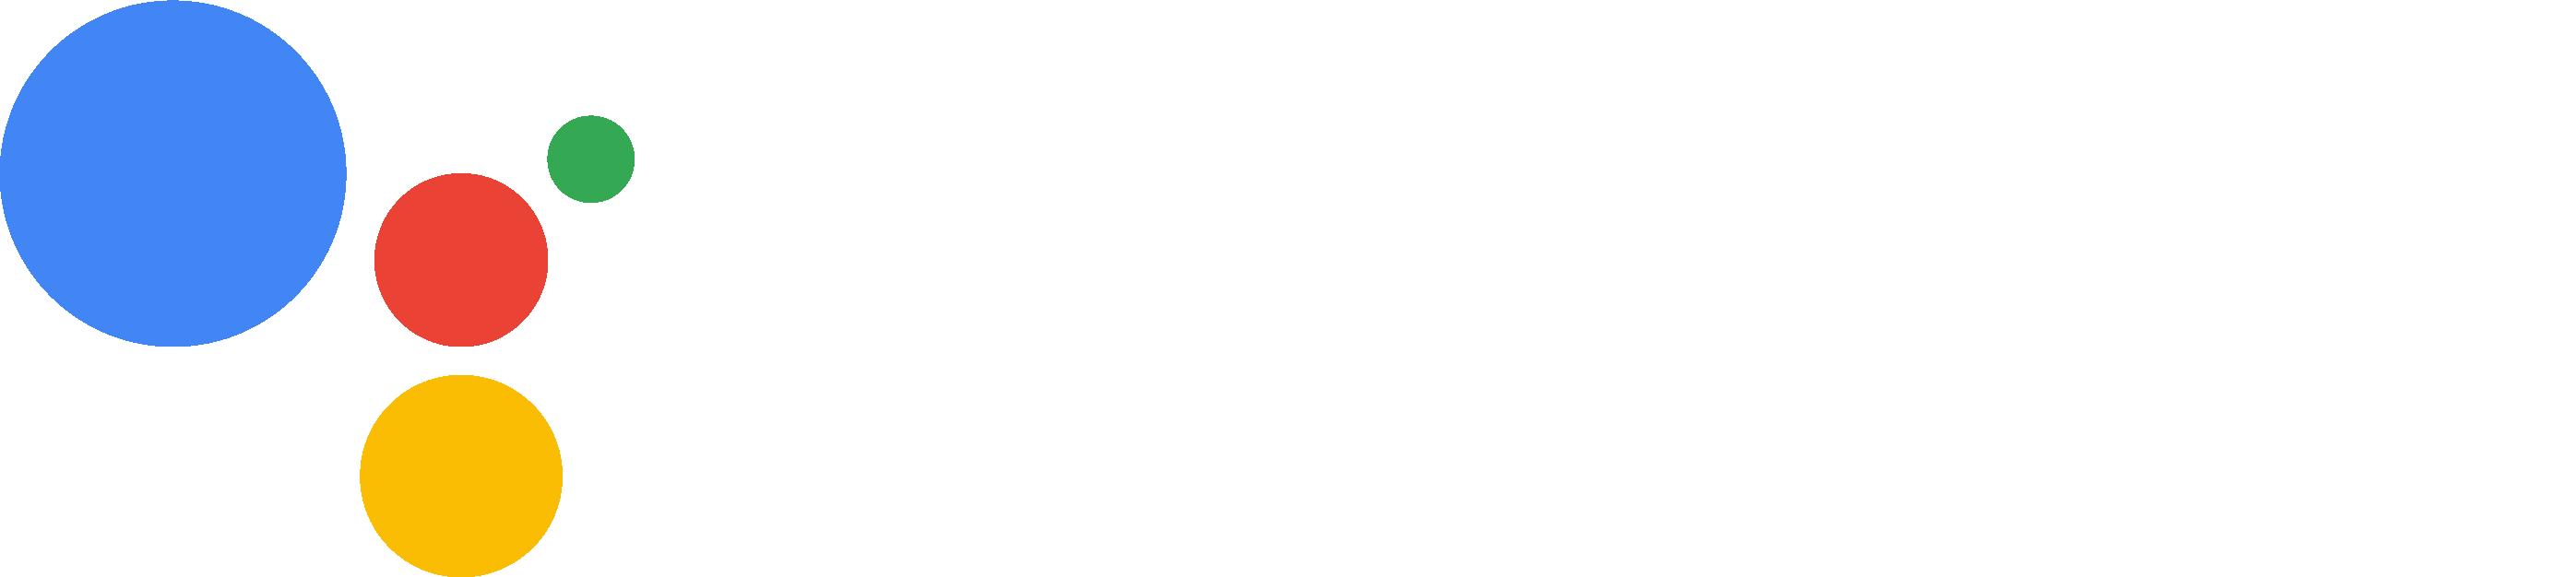 Hey Google Logo